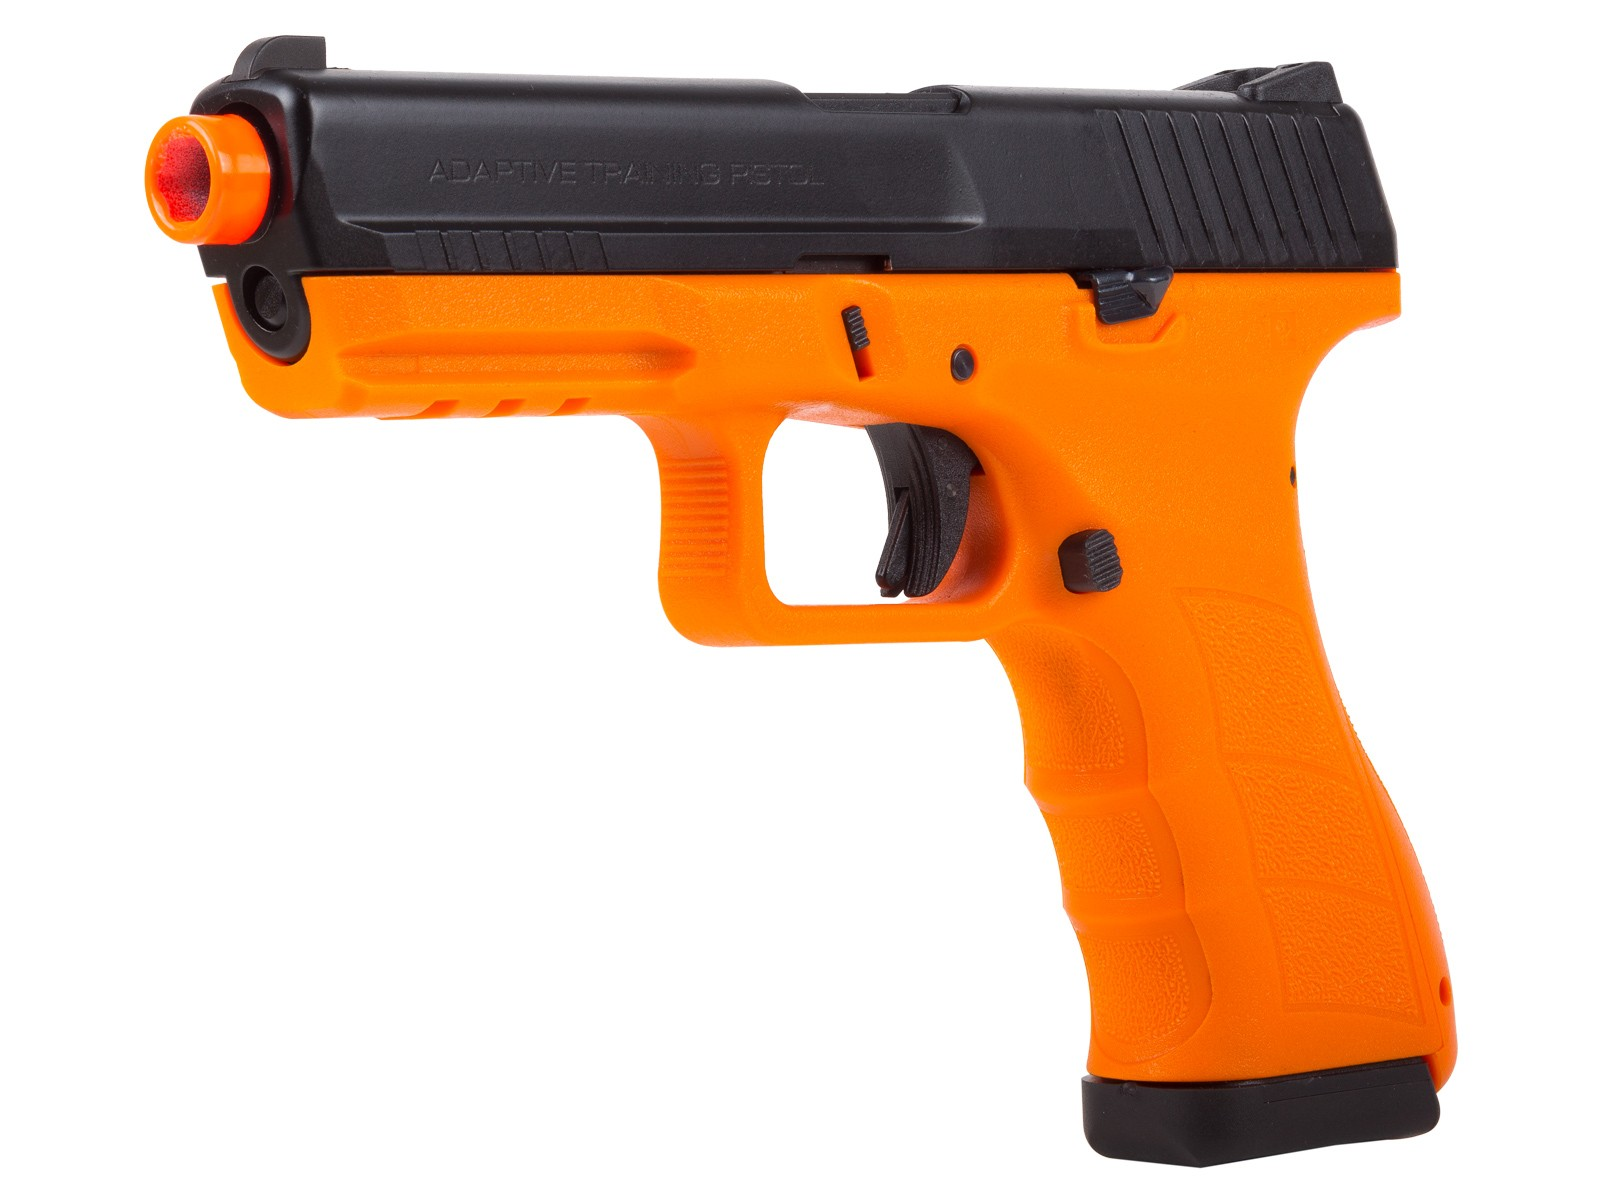 KWA ATP-LE2 Adaptive Training Airsoft Pistol